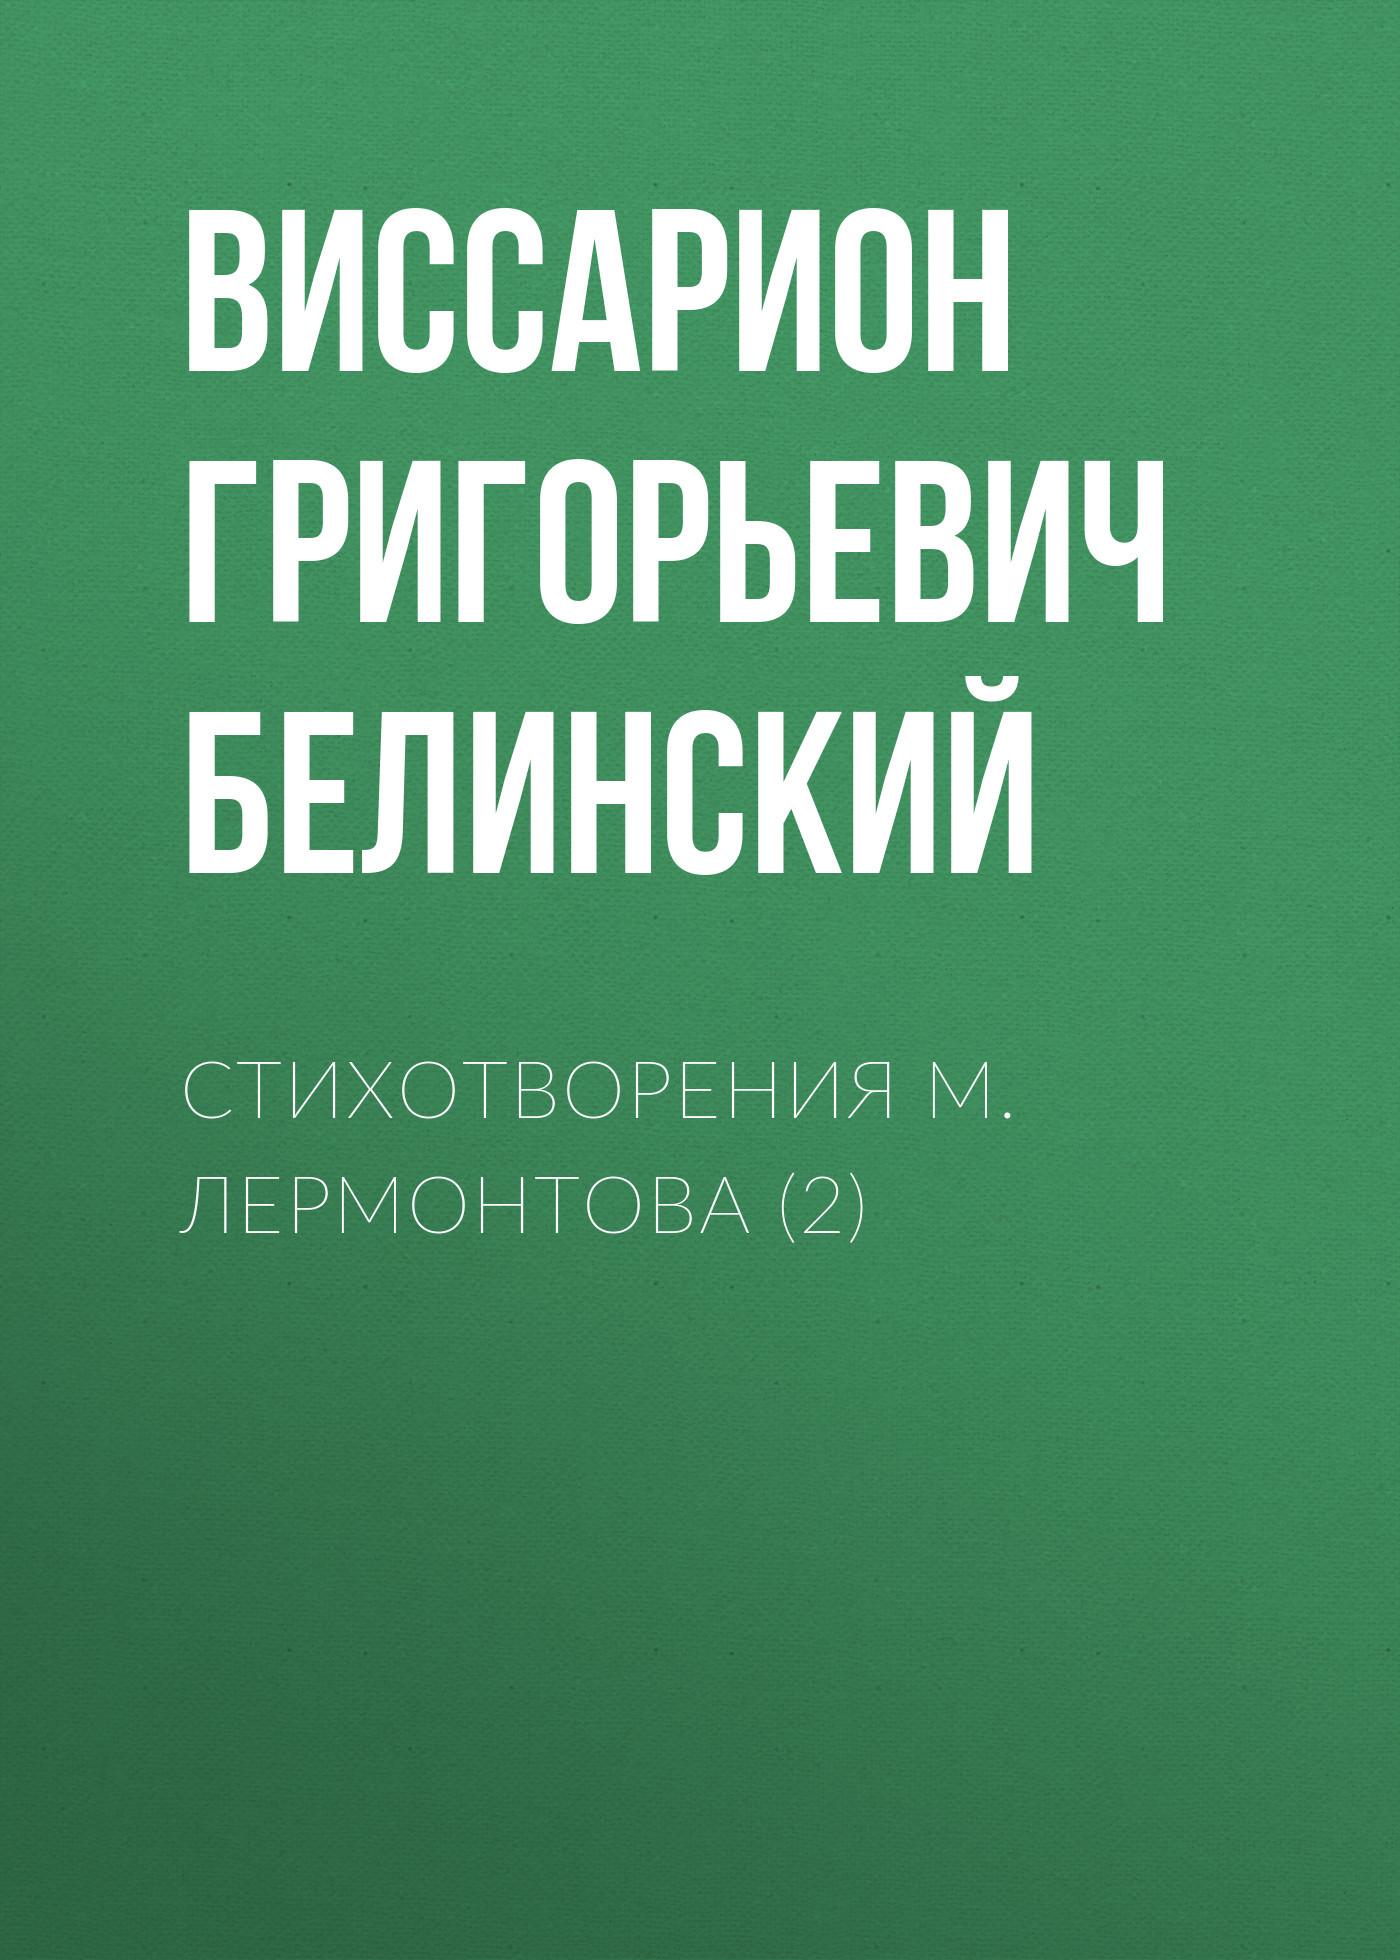 Стихотворения М. Лермонтова (2)